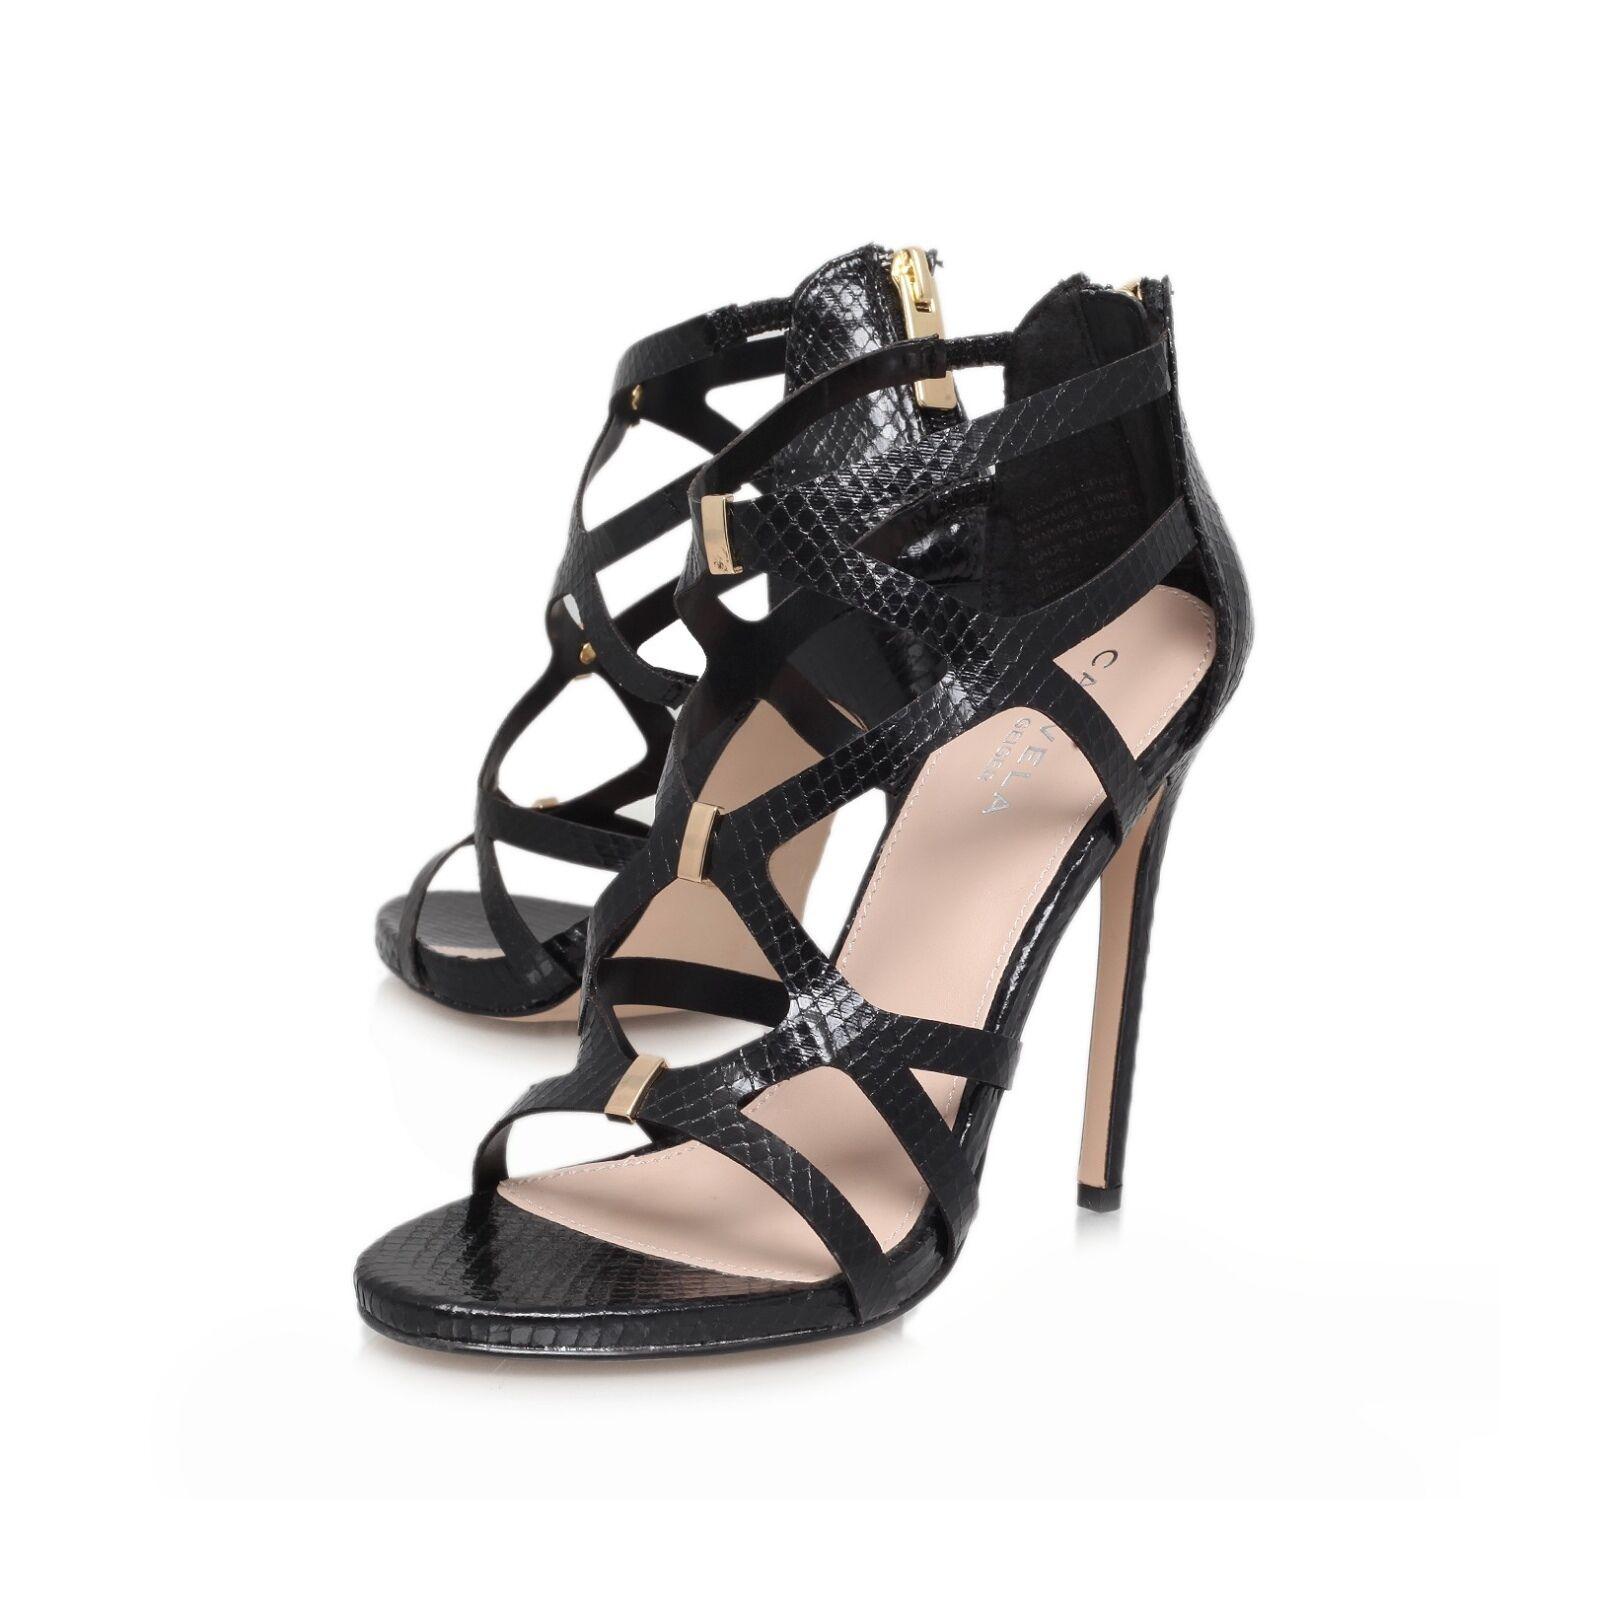 CARVELA BLACK Schuhe .. STRAPPY / STILETTO SANDALS /  UK 7  EU 40 NEW KURT GEIGER